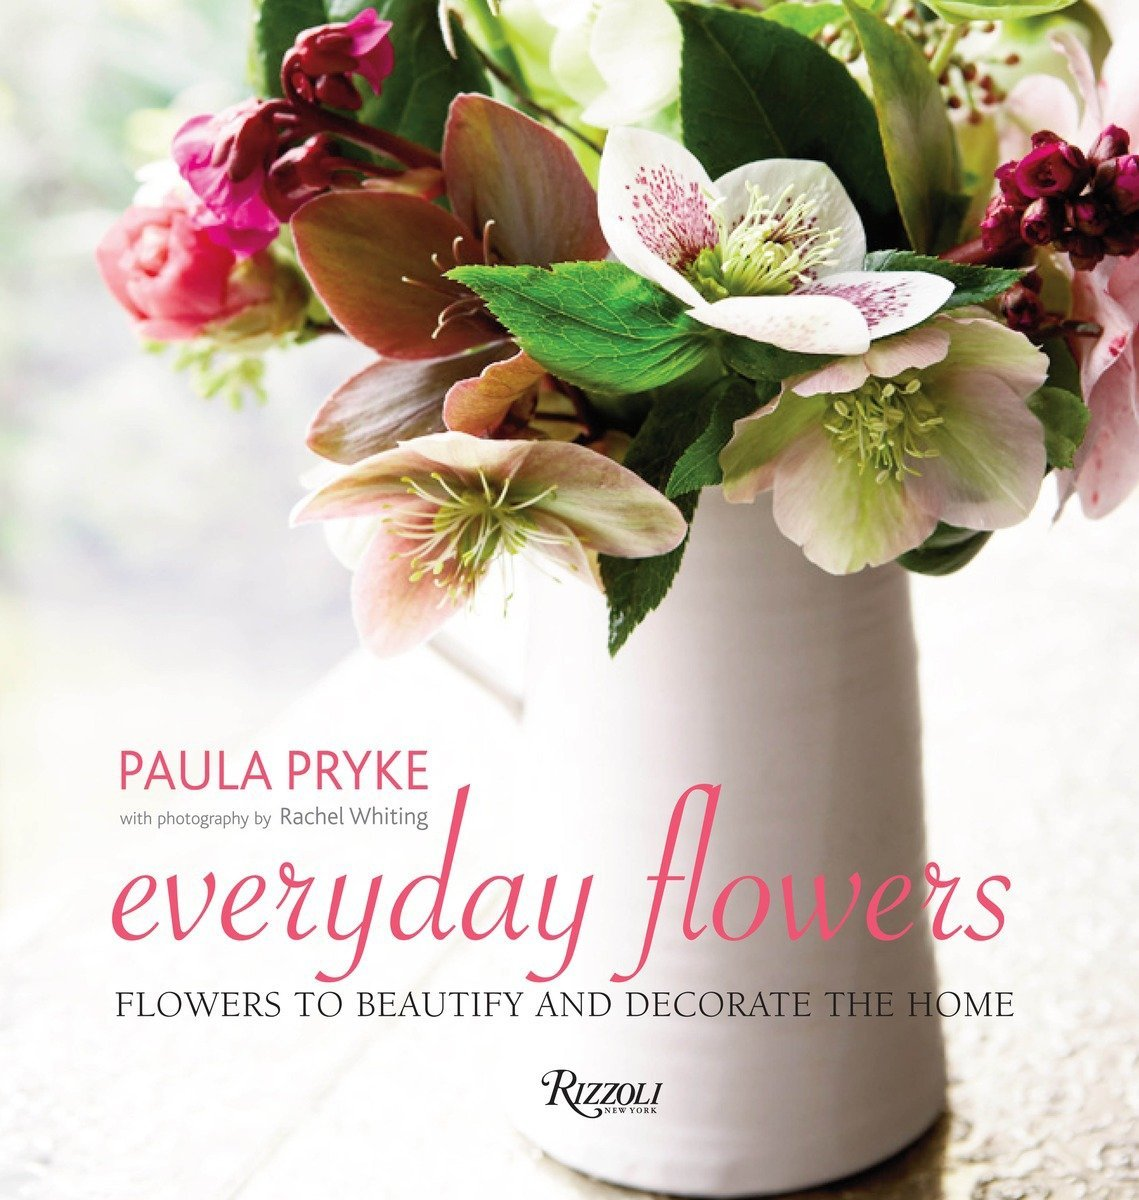 Everyday flowers flowers to beautify and decorate the home paula everyday flowers flowers to beautify and decorate the home paula pryke rachel whiting 9780789331281 amazon books mightylinksfo